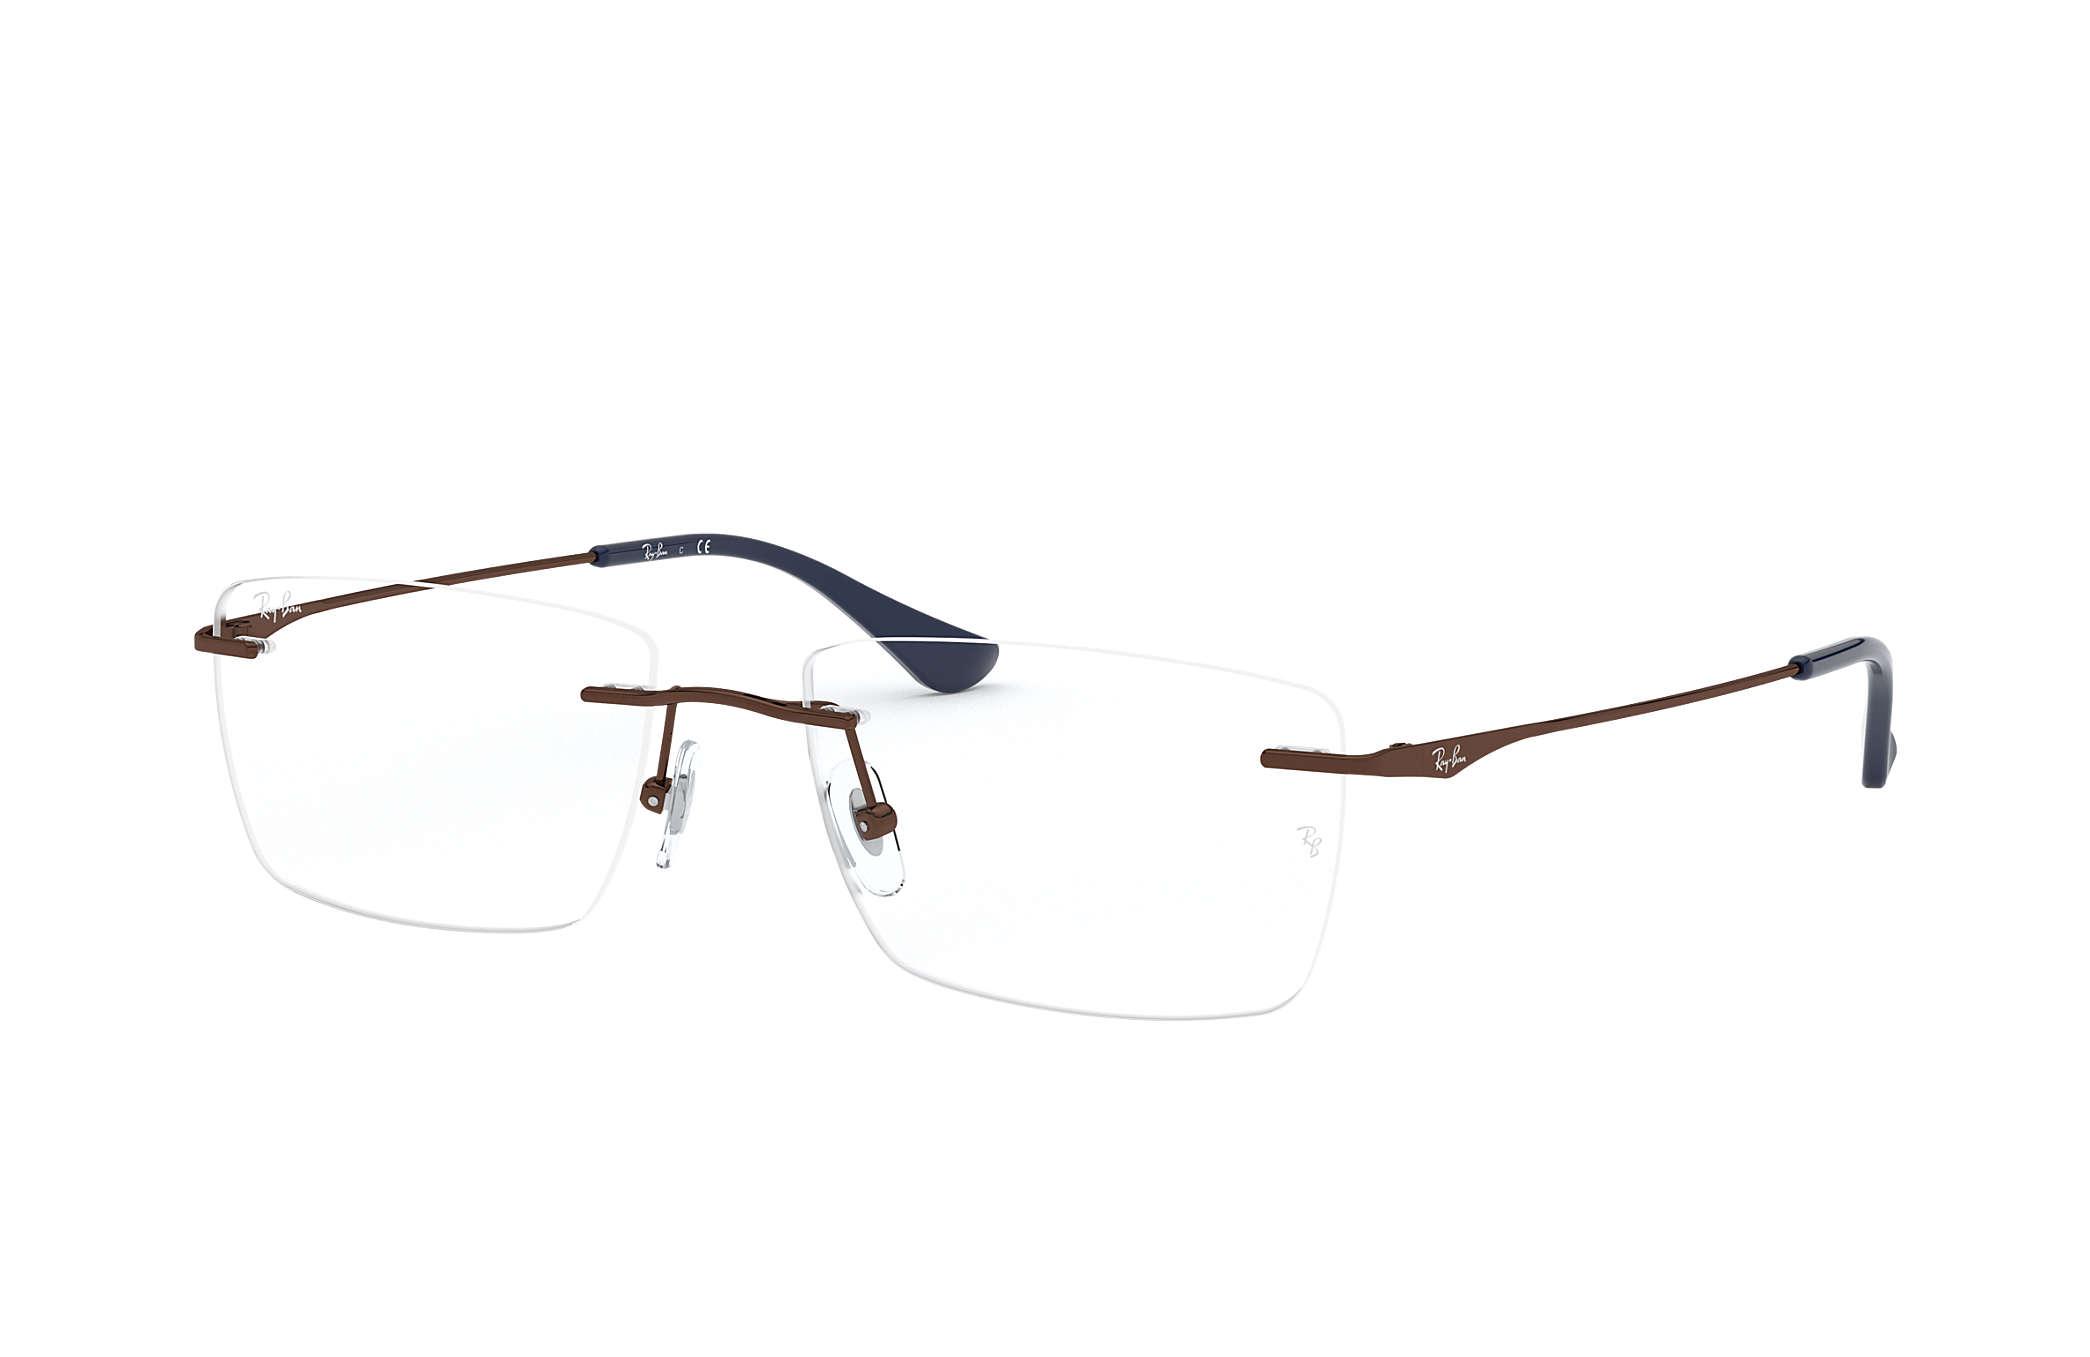 b001c68ed56 Ray-Ban eyeglasses RB6411D Brown - Metal - 0RX6411D253156